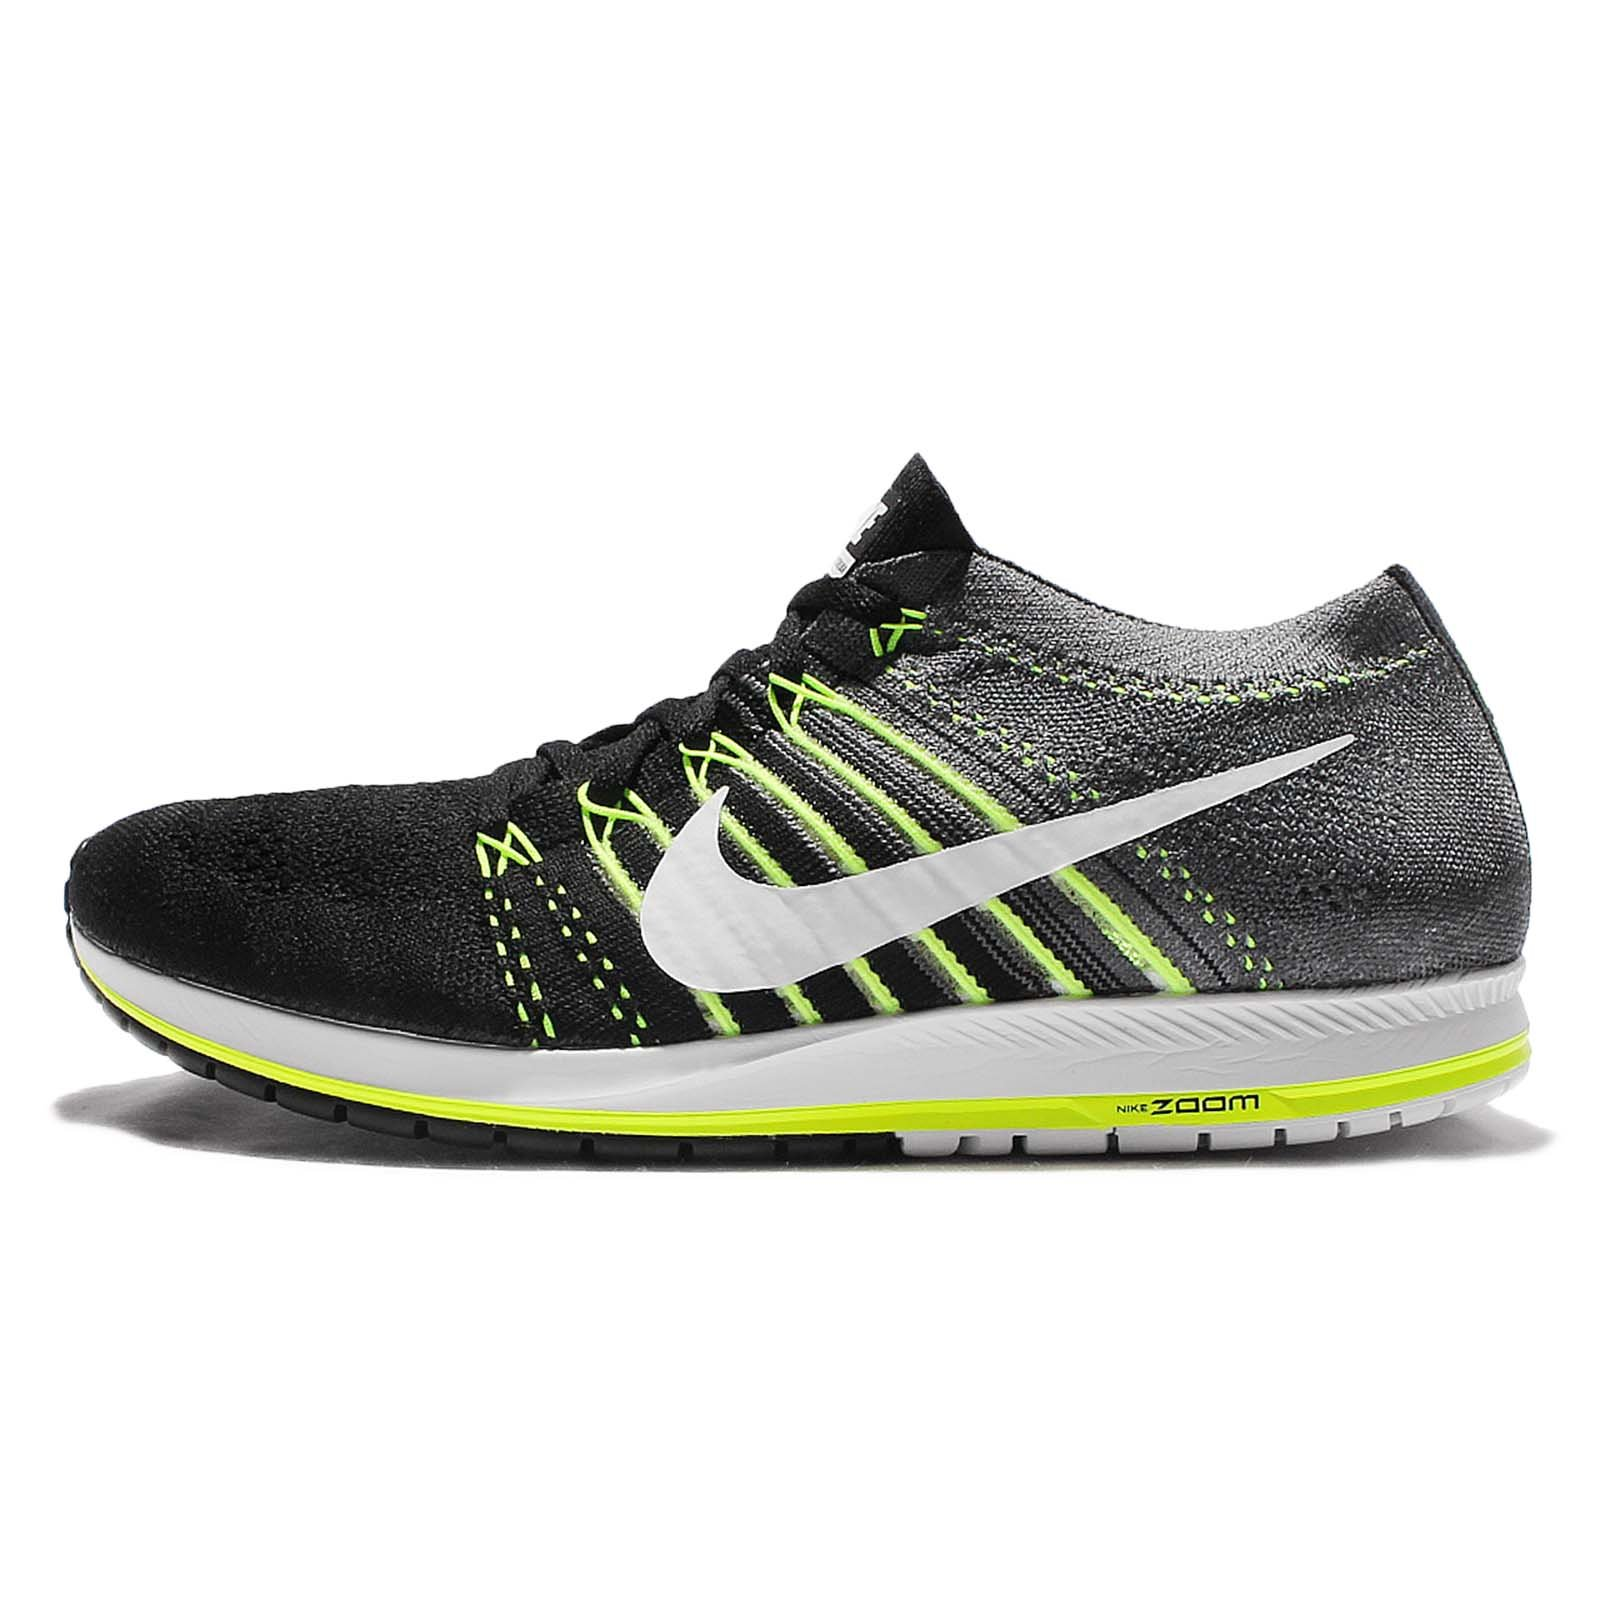 c1a71edf01a35 Galleon - Nike Flyknit Streak Running Shoes Black White Dark Grey Volt  835994 001